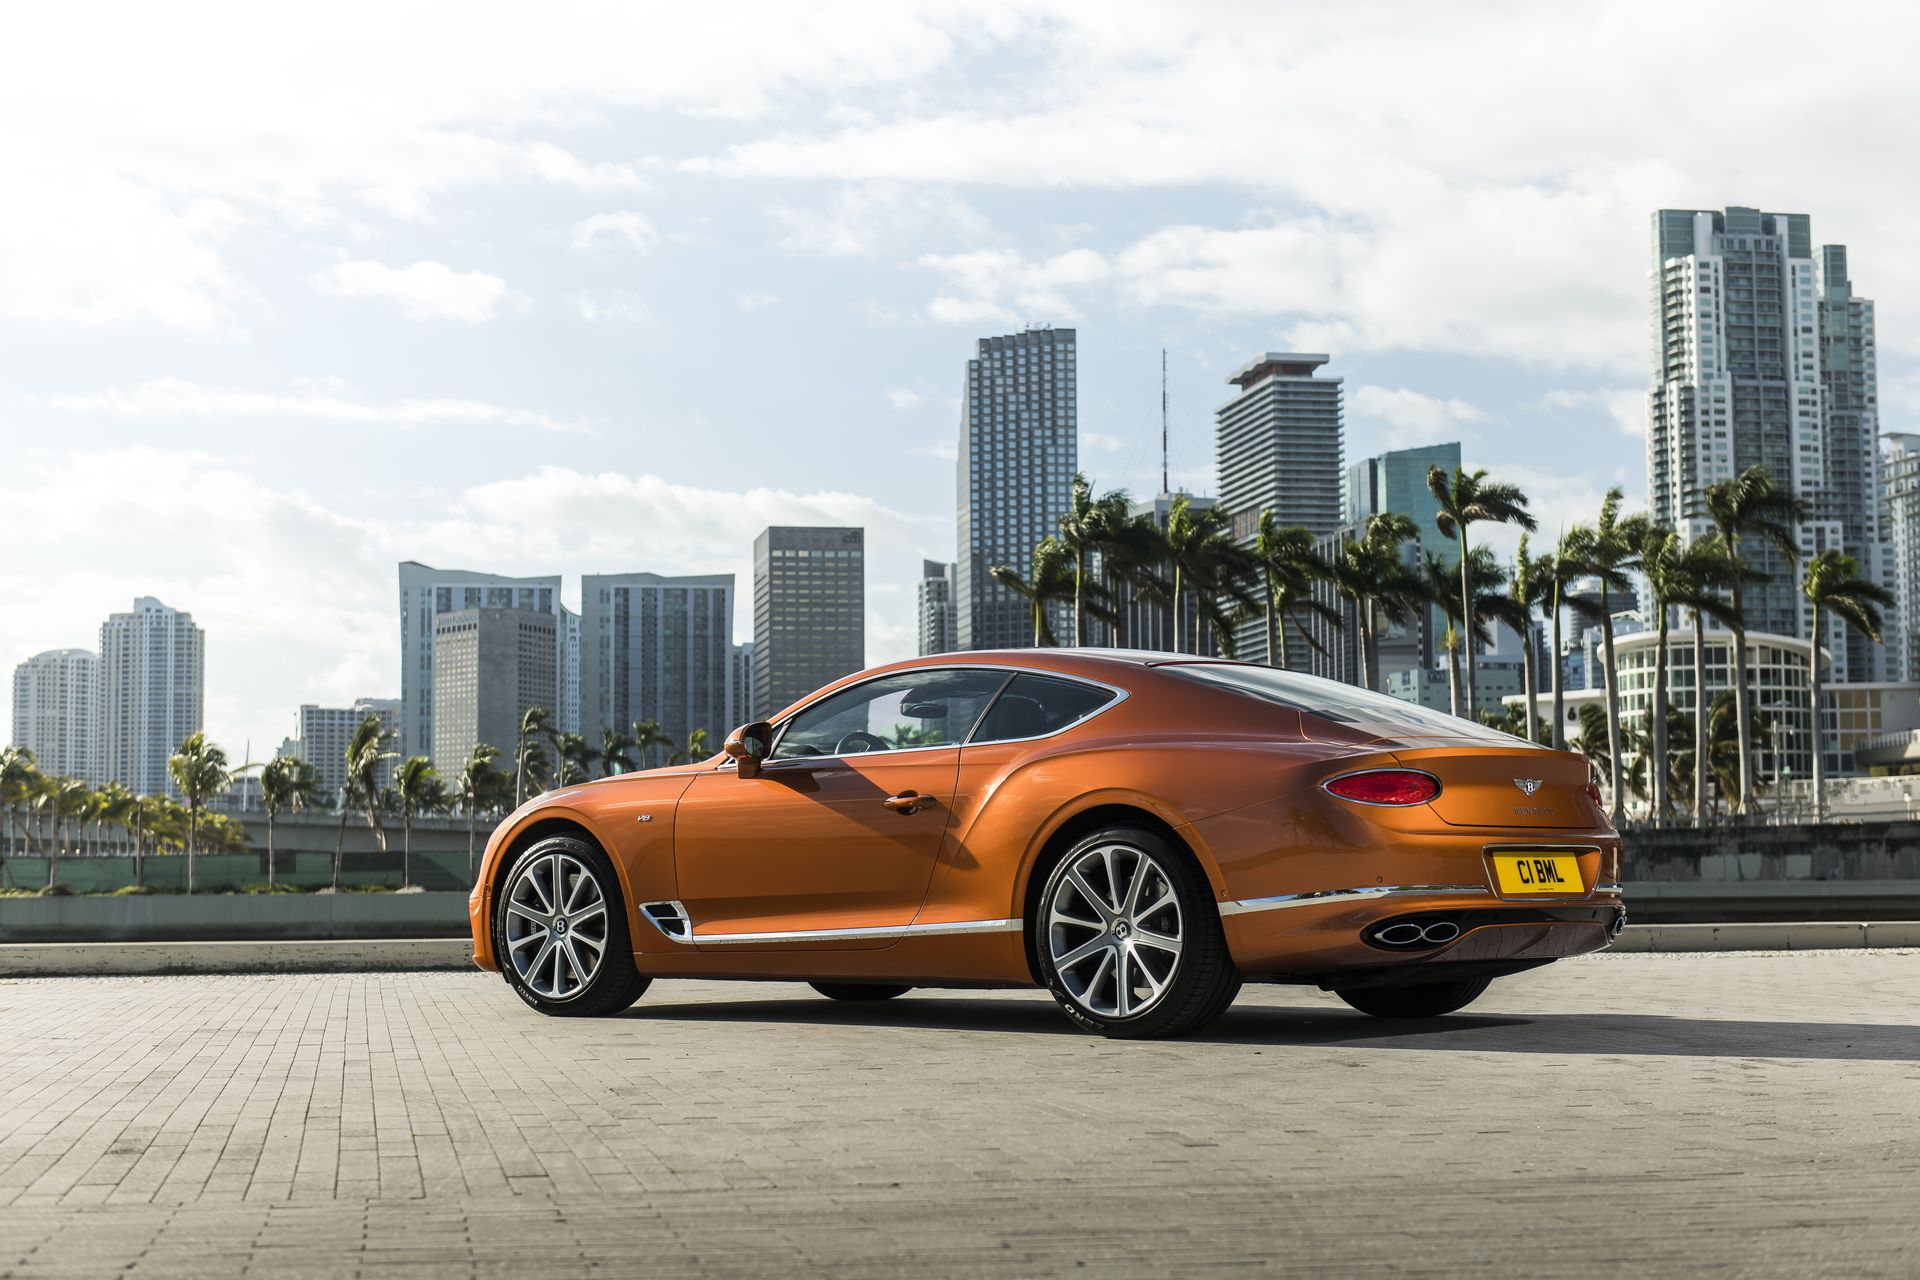 Bentley Continental Gt V8 2019 9